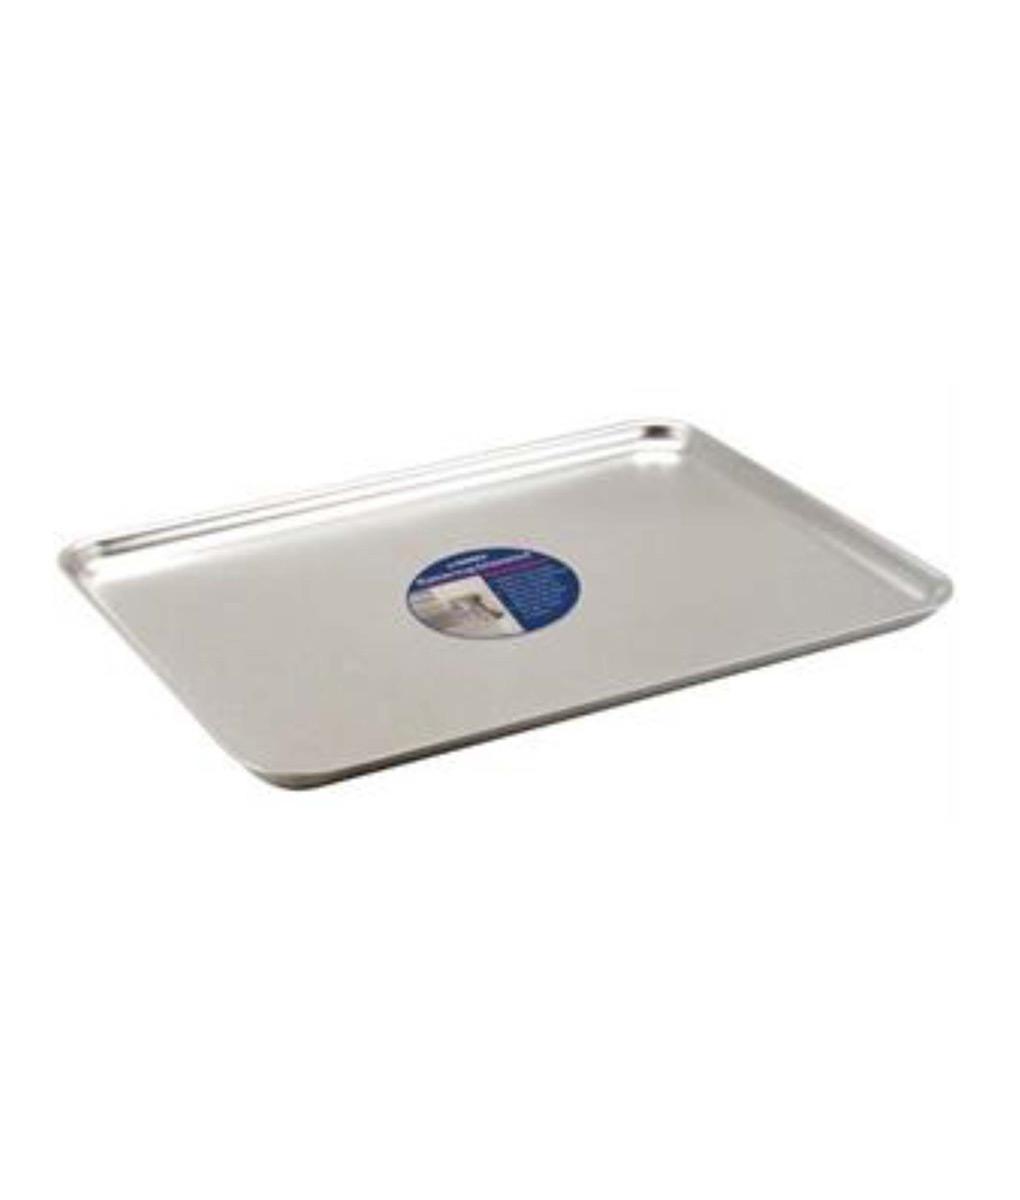 Baking Sheet Flat 320mm x 220 – Catering Solutions by Ken Hands Bakeware